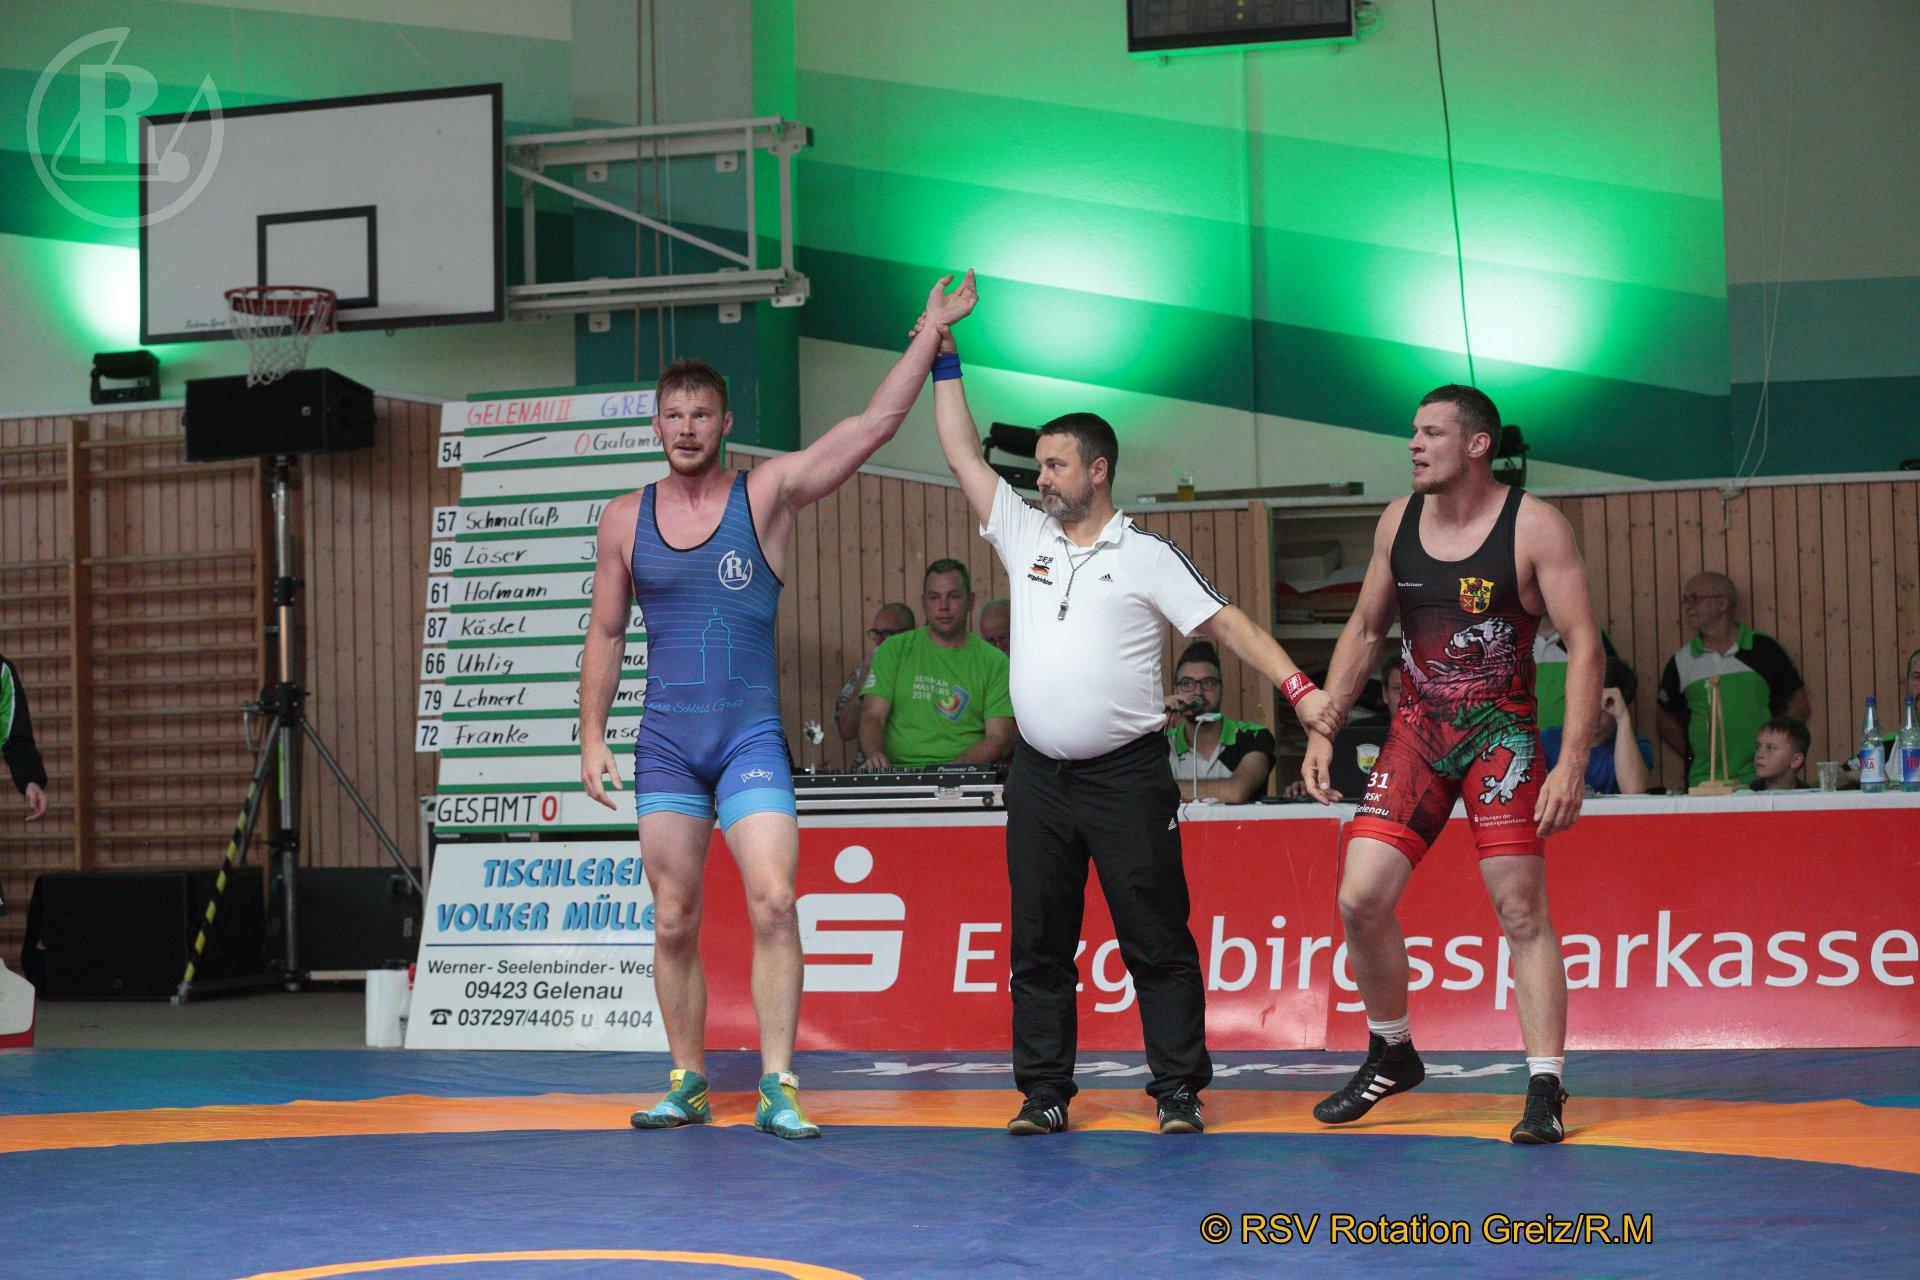 125 kg Freistil: Schaarschmidt, Maik, WKG Gelenau II/Chemnitz gegen Wendel, Sebastian, RSV Rotation Greiz II - 0:4/TÜ/0:15/04:51